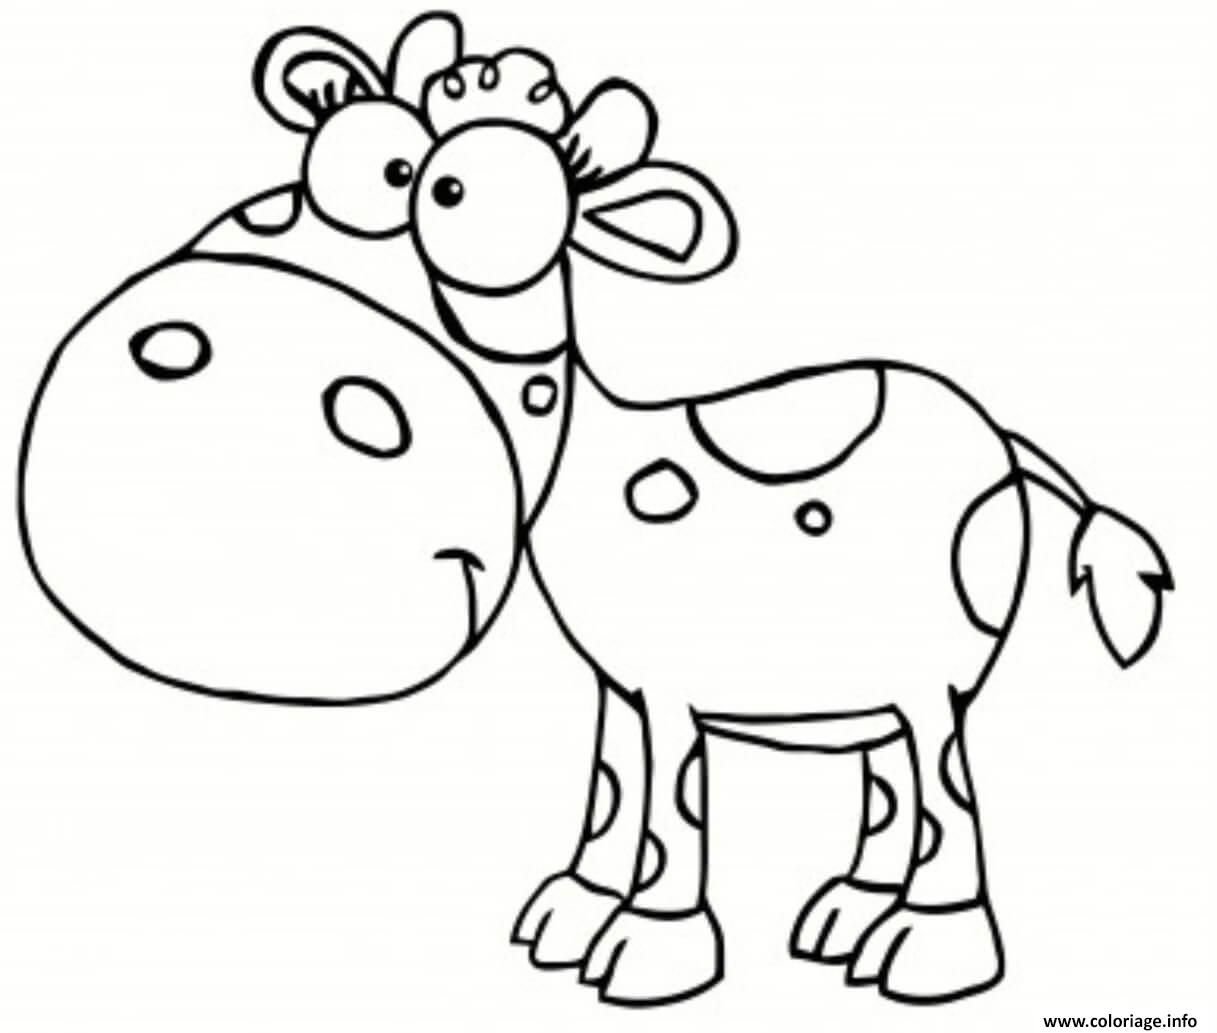 Coloriage vache animaux de la ferme rigolo Dessin à ...